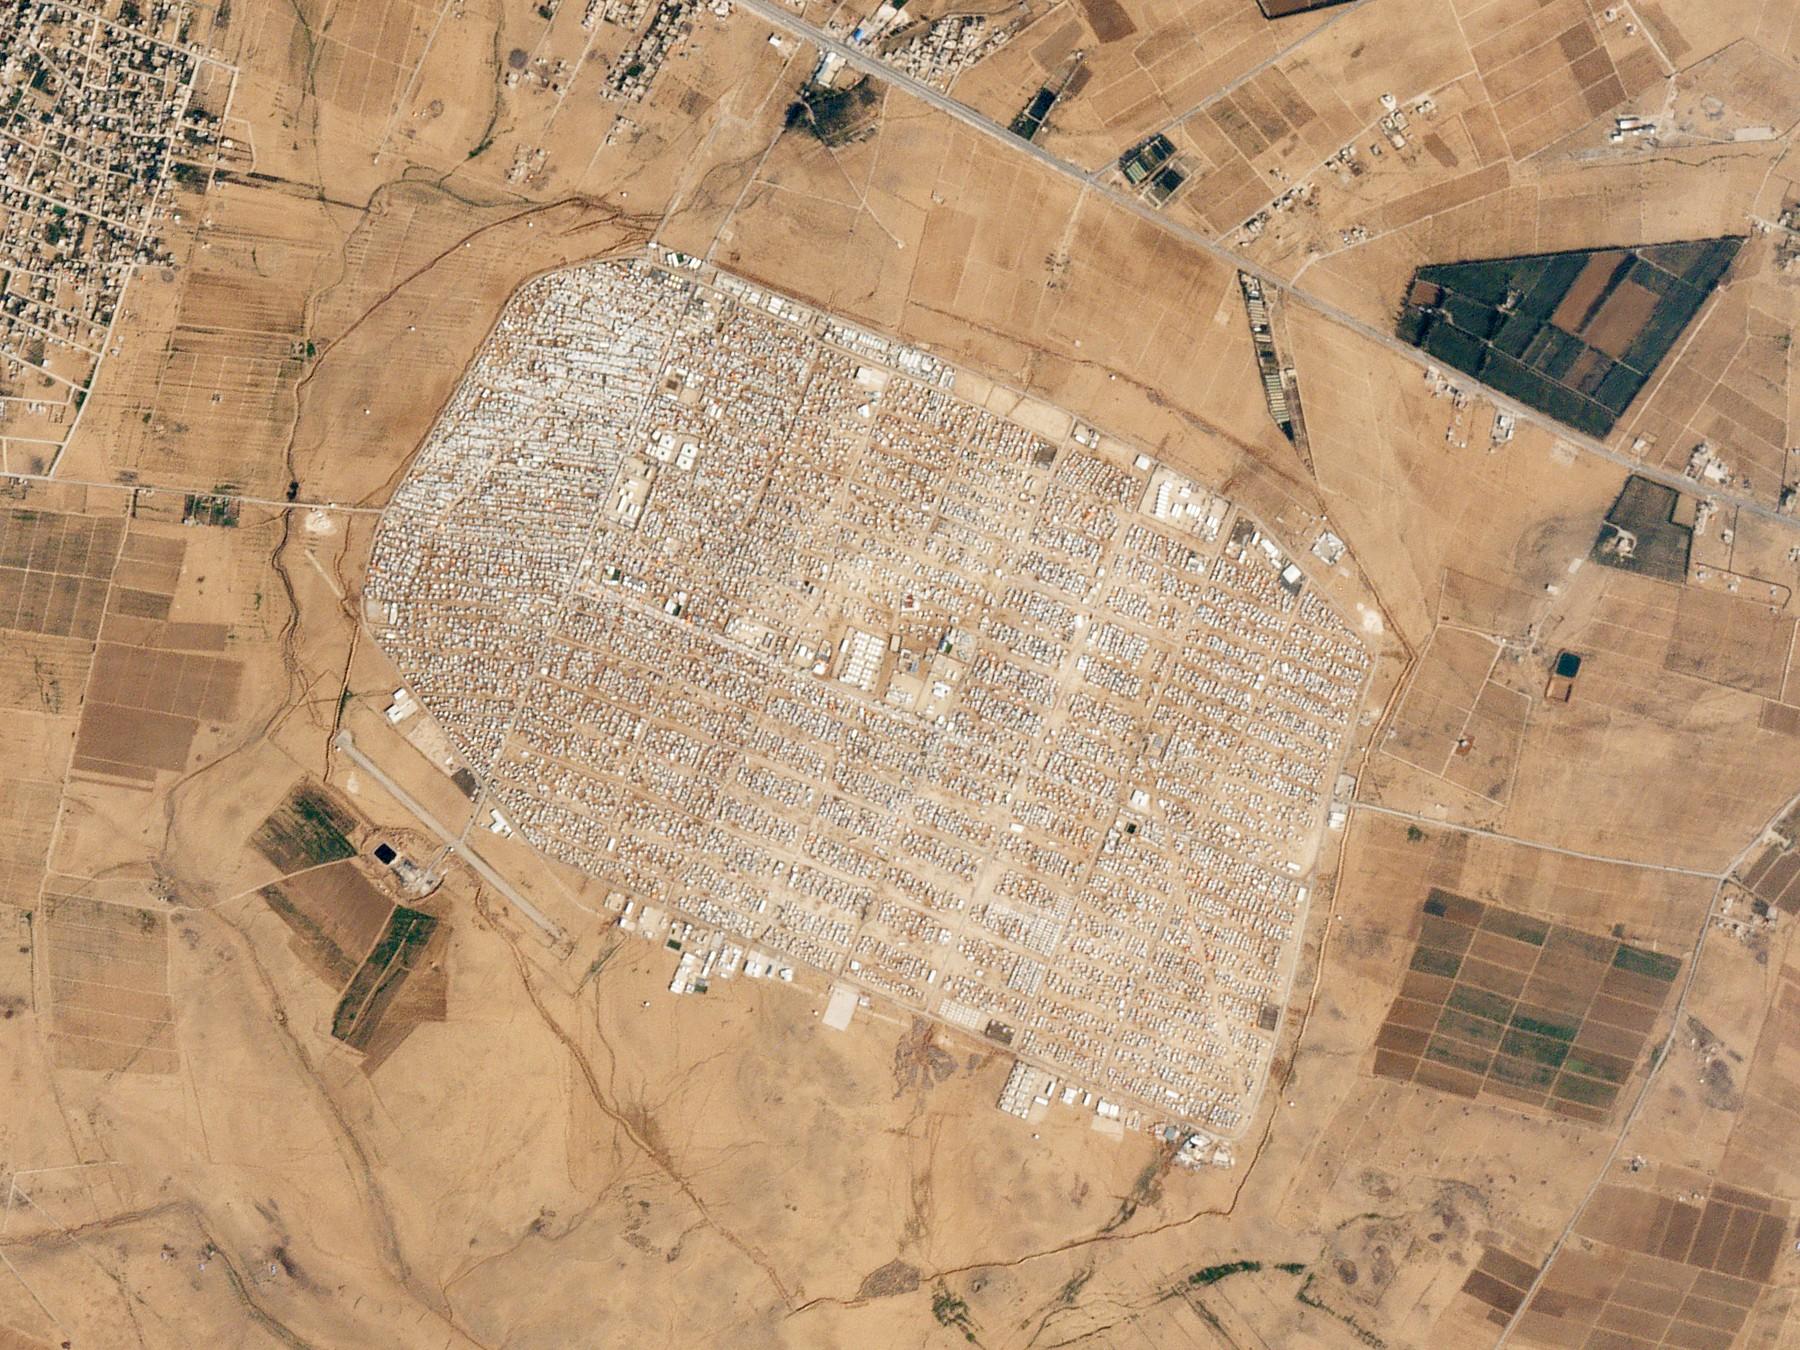 Zaatari_Refugee_Camp